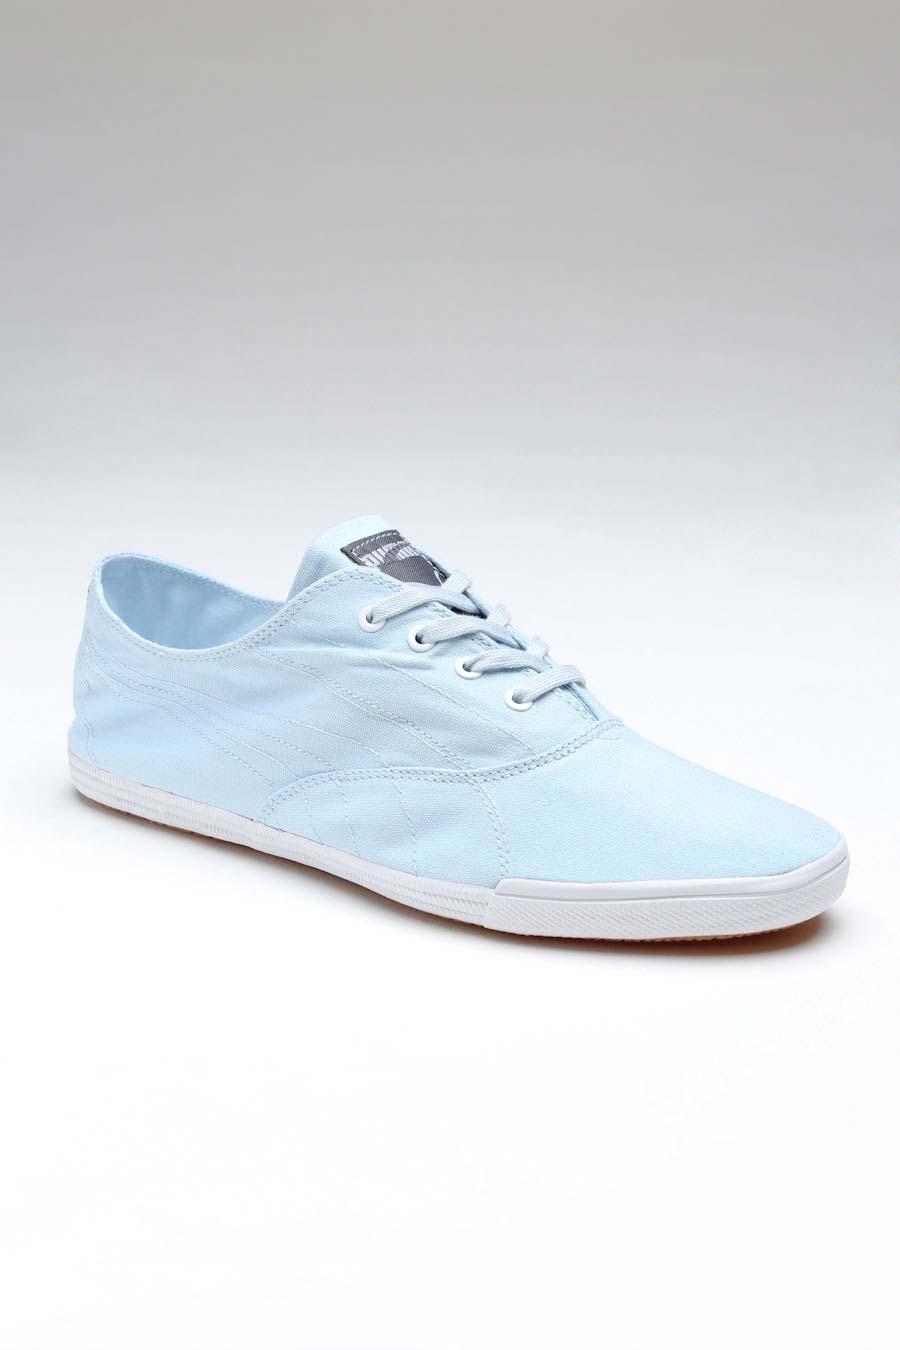 67172a79fe74 Puma Tekkies Sneaker Free Credit Repair And Bankruptcy Information ...